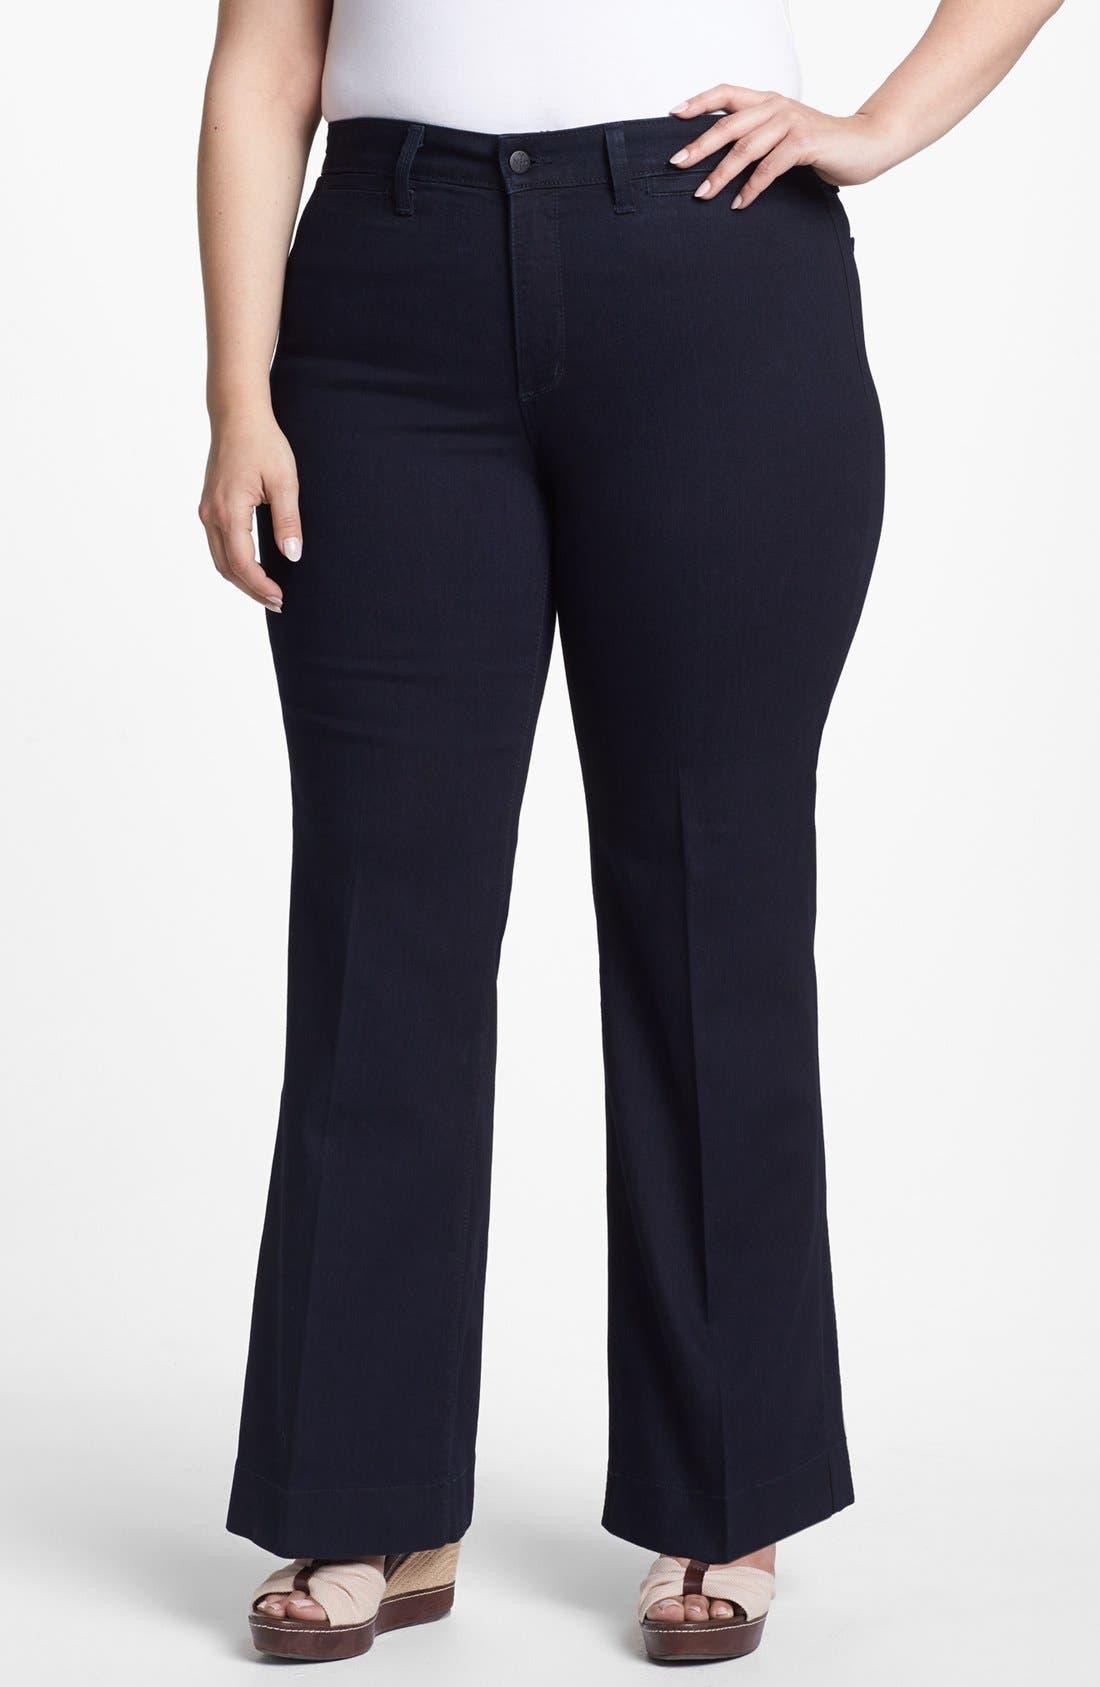 Alternate Image 1 Selected - NYDJ 'Greta' Trouser Jeans (Plus Size)